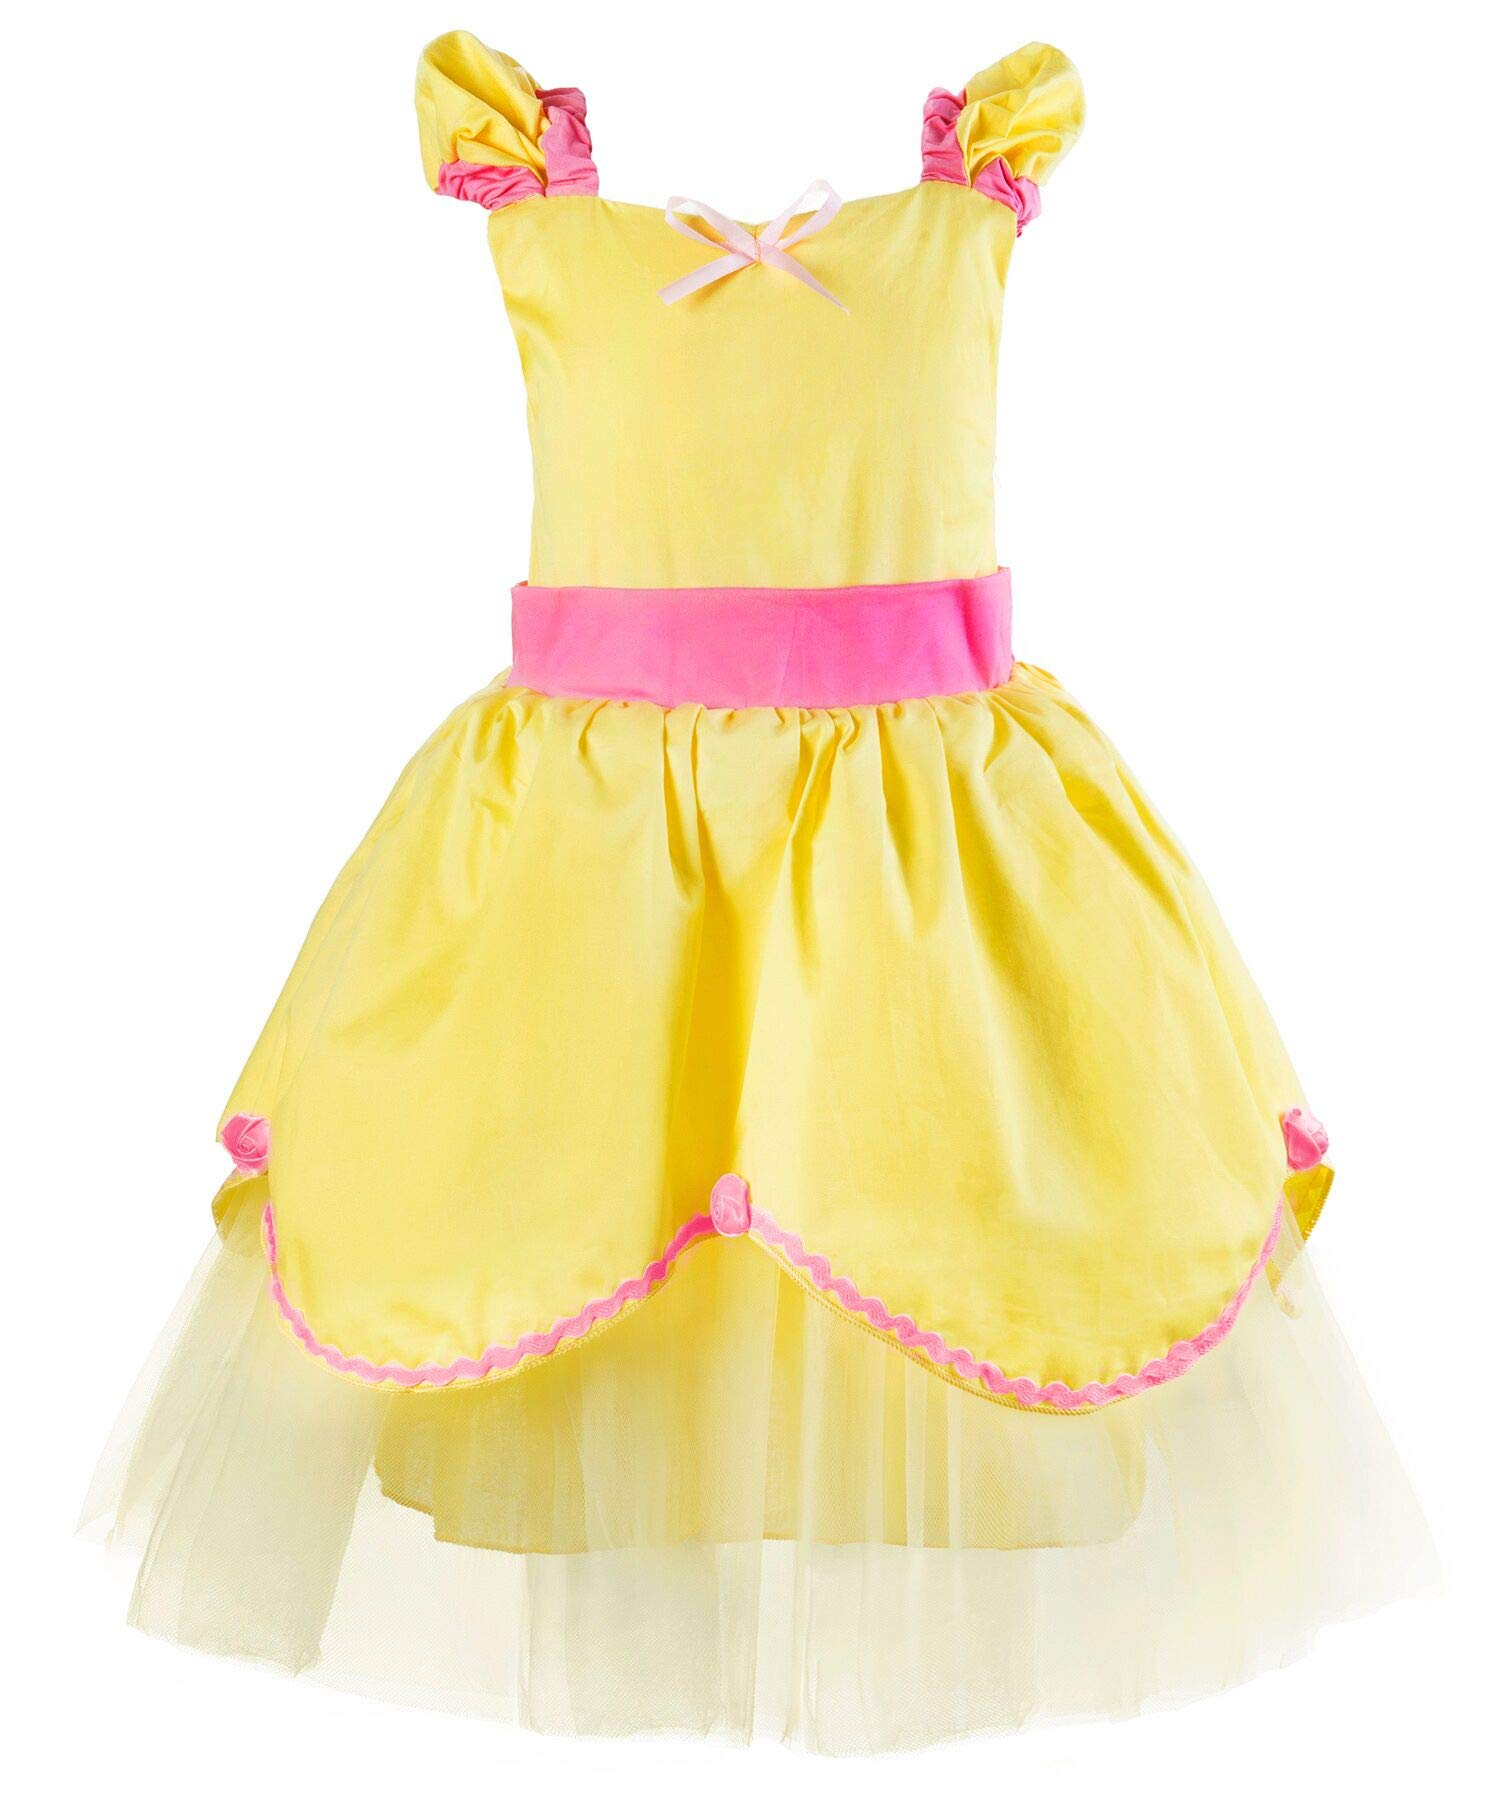 Okidokiyo Baby Girl Princess Sofia Belle Aurora Dress up Toddler Costume (18-24 Months, Belle)